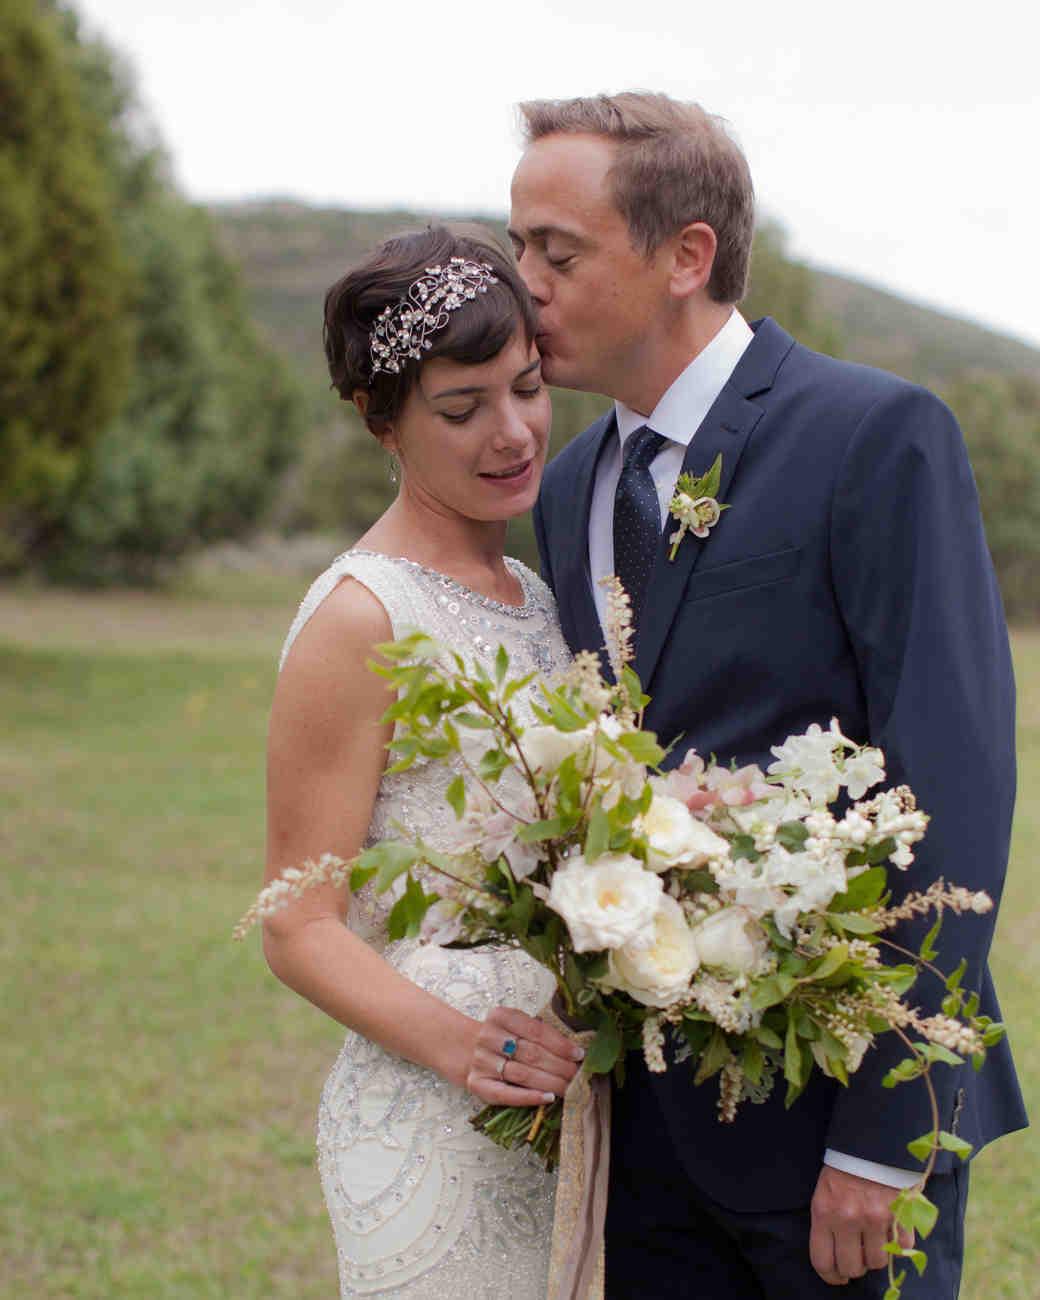 lizzy-pat-wedding-couple-058-s111777-0115.jpg